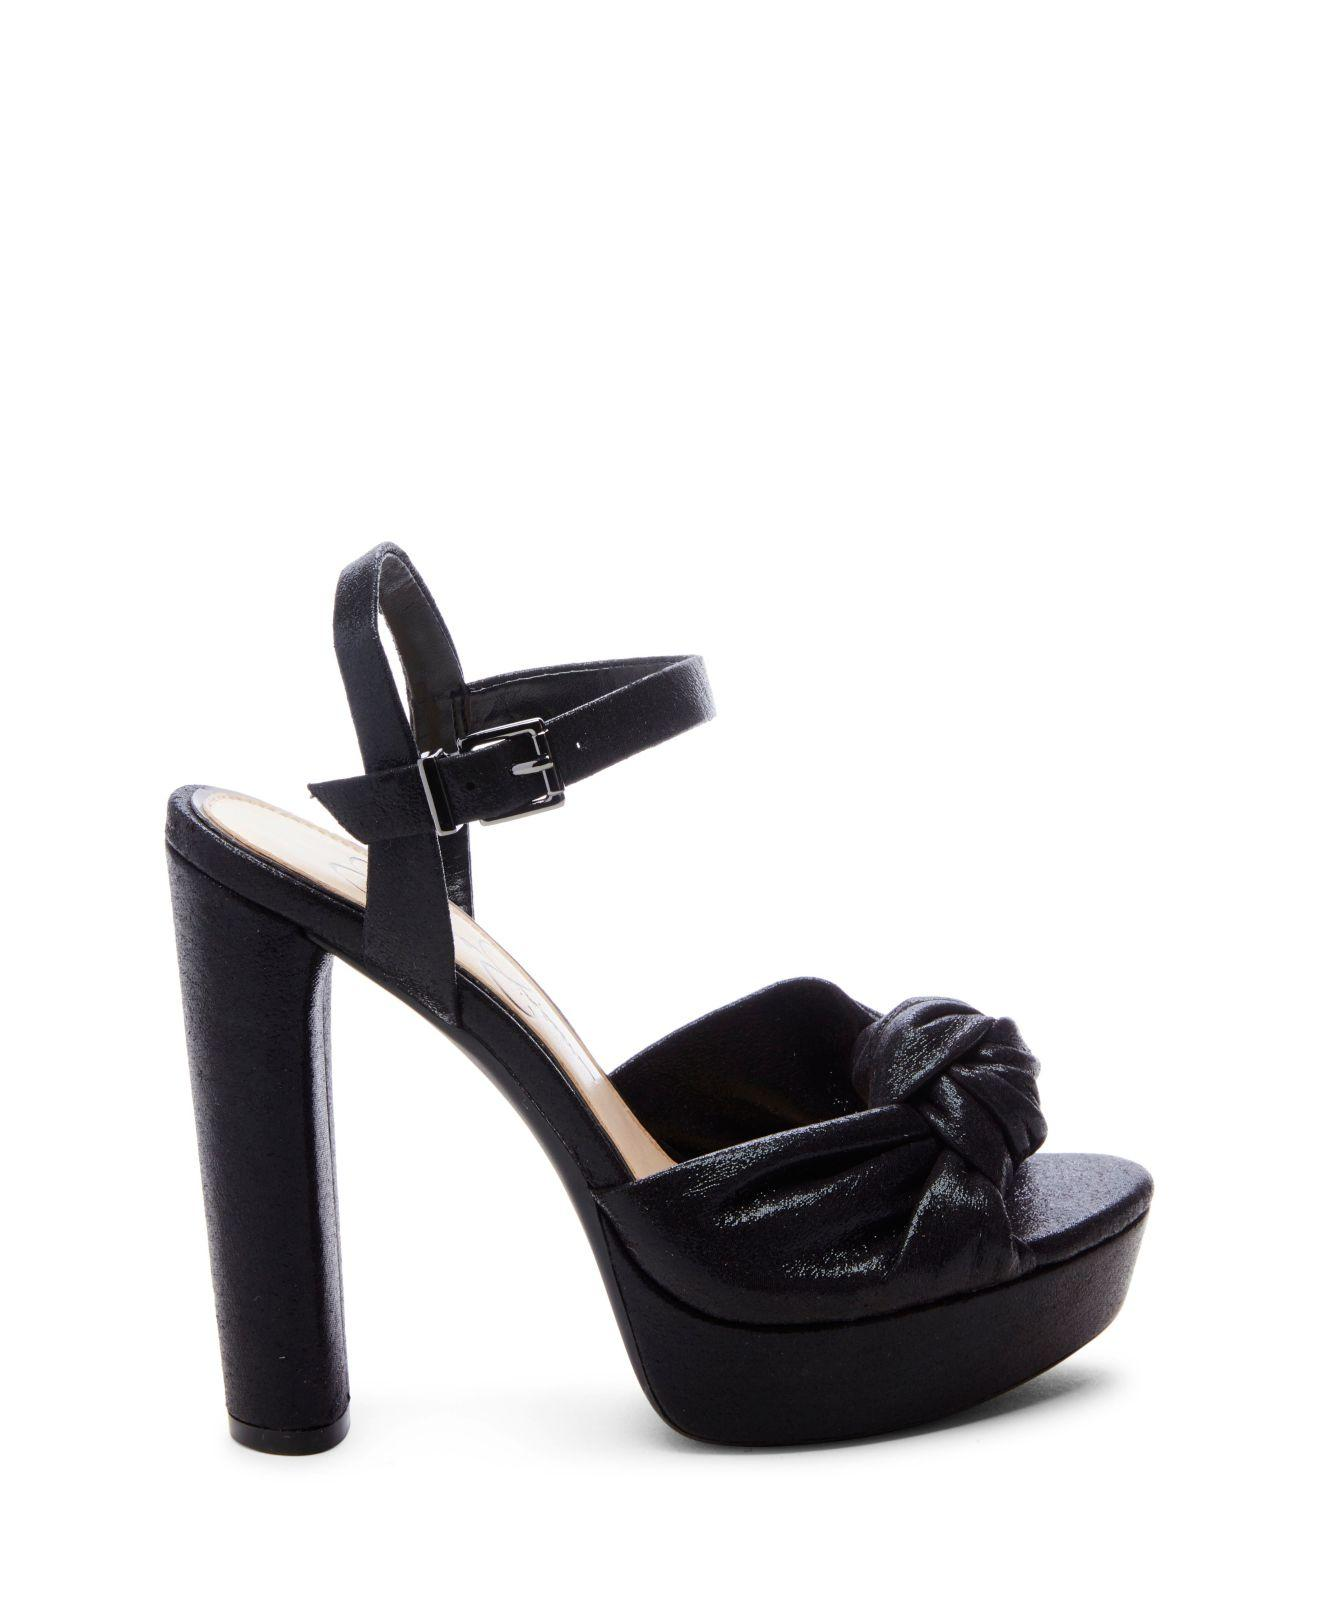 493d49aab92 Lyst - Jessica Simpson Ivrey Knot Platform Sandals in Black - Save 1%